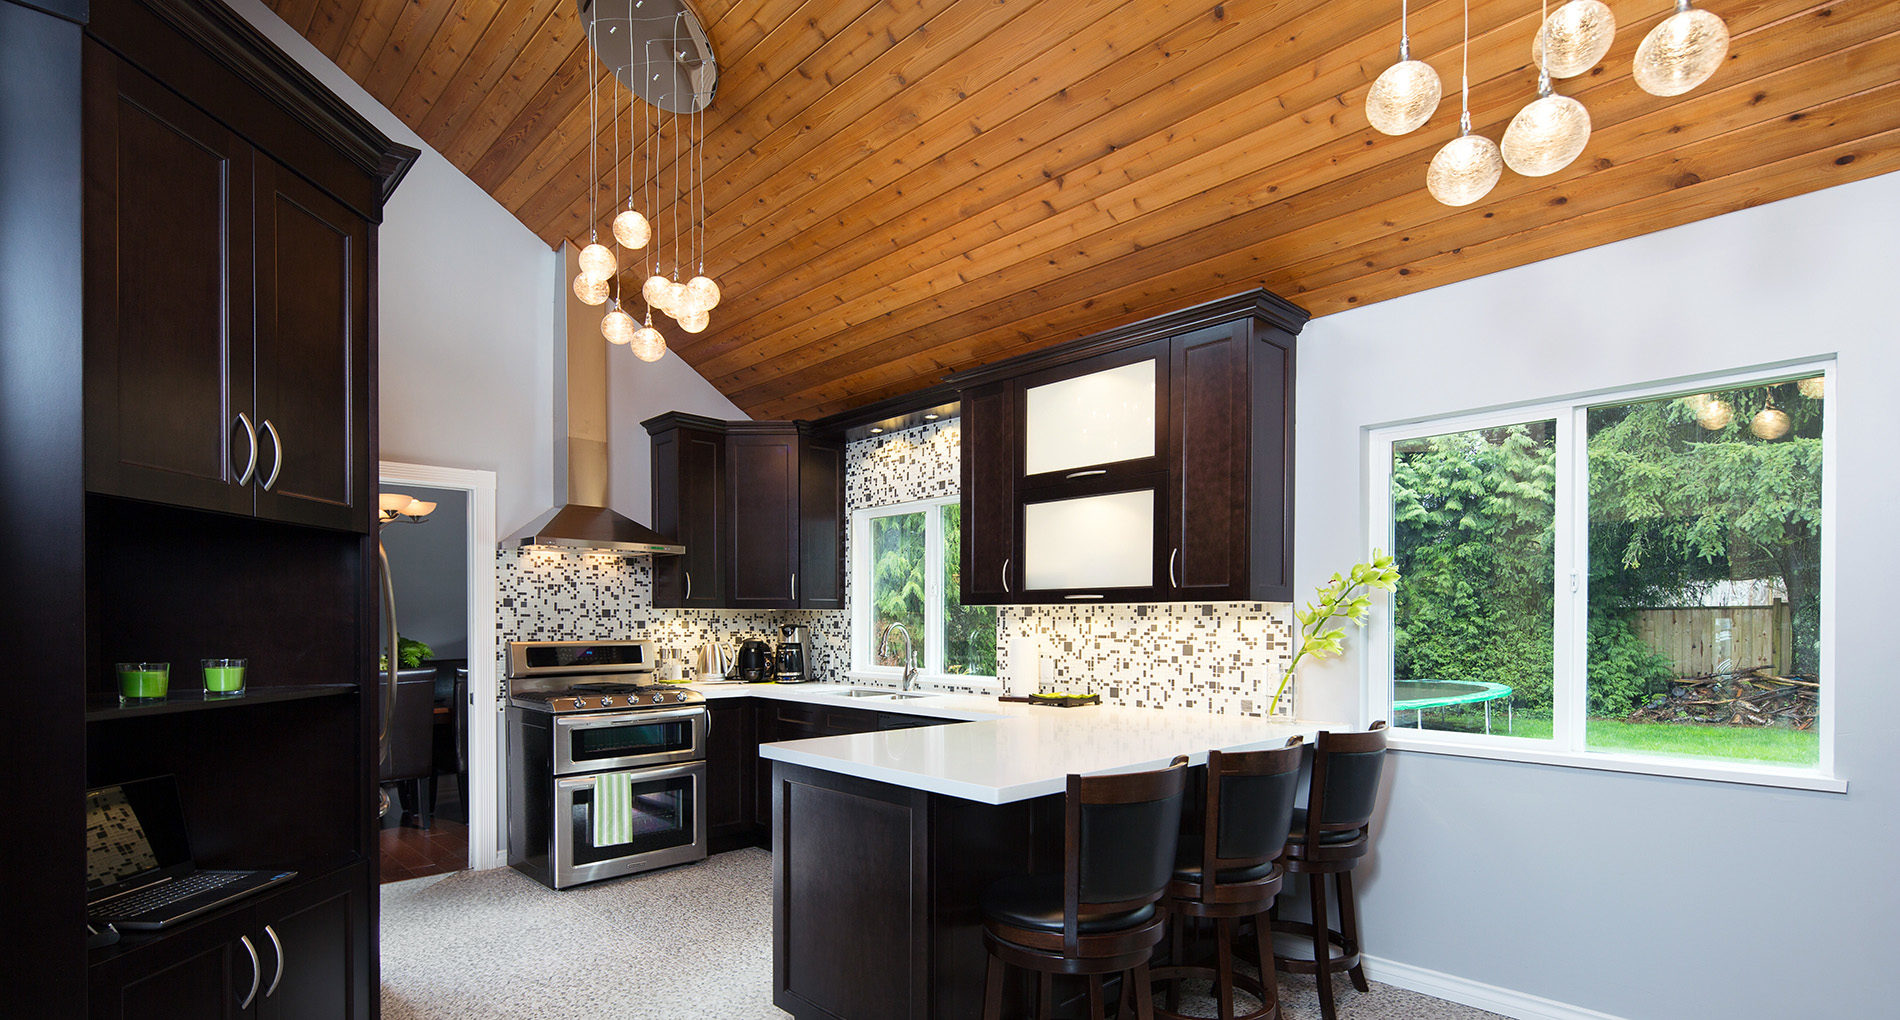 Kitchen Renovation Mapleridge Normanave Slider